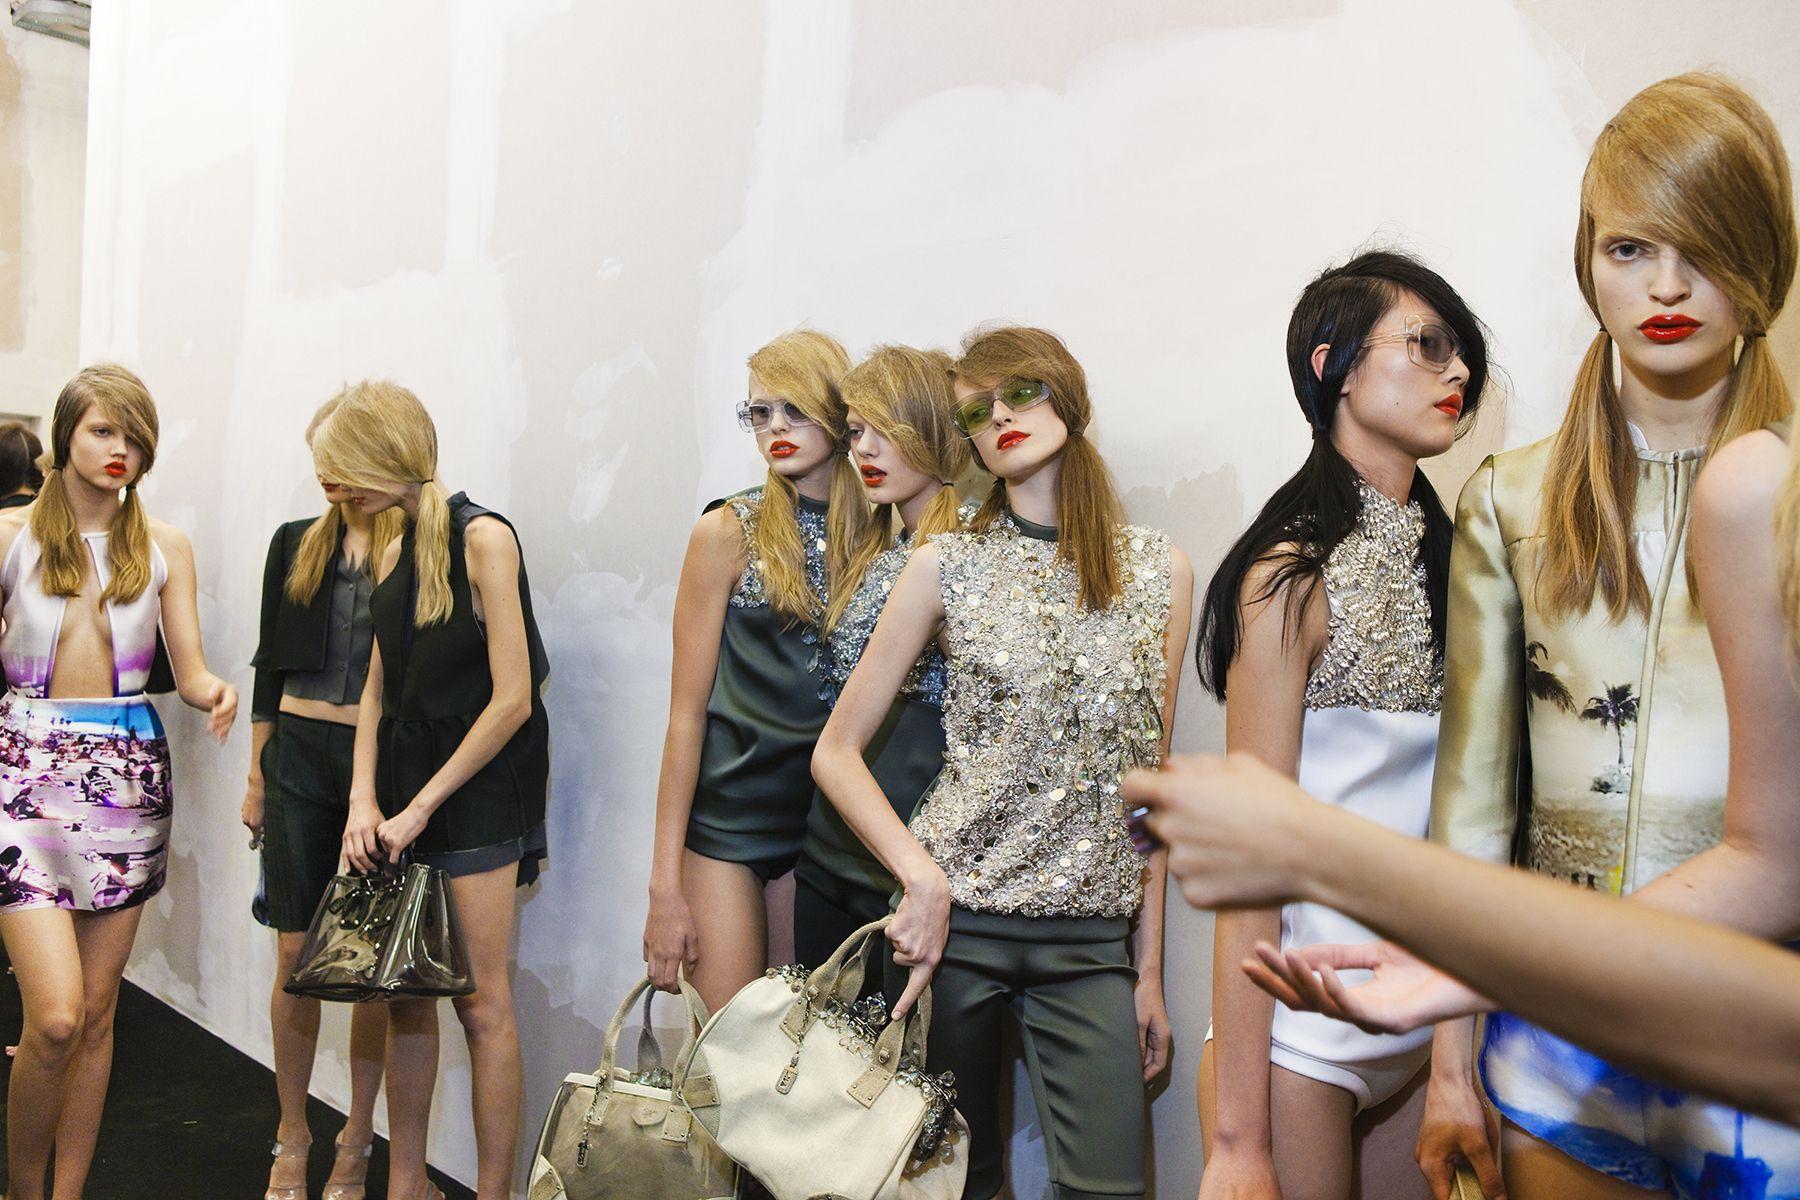 Models backstage at Prada's spring show, Milan, 2009